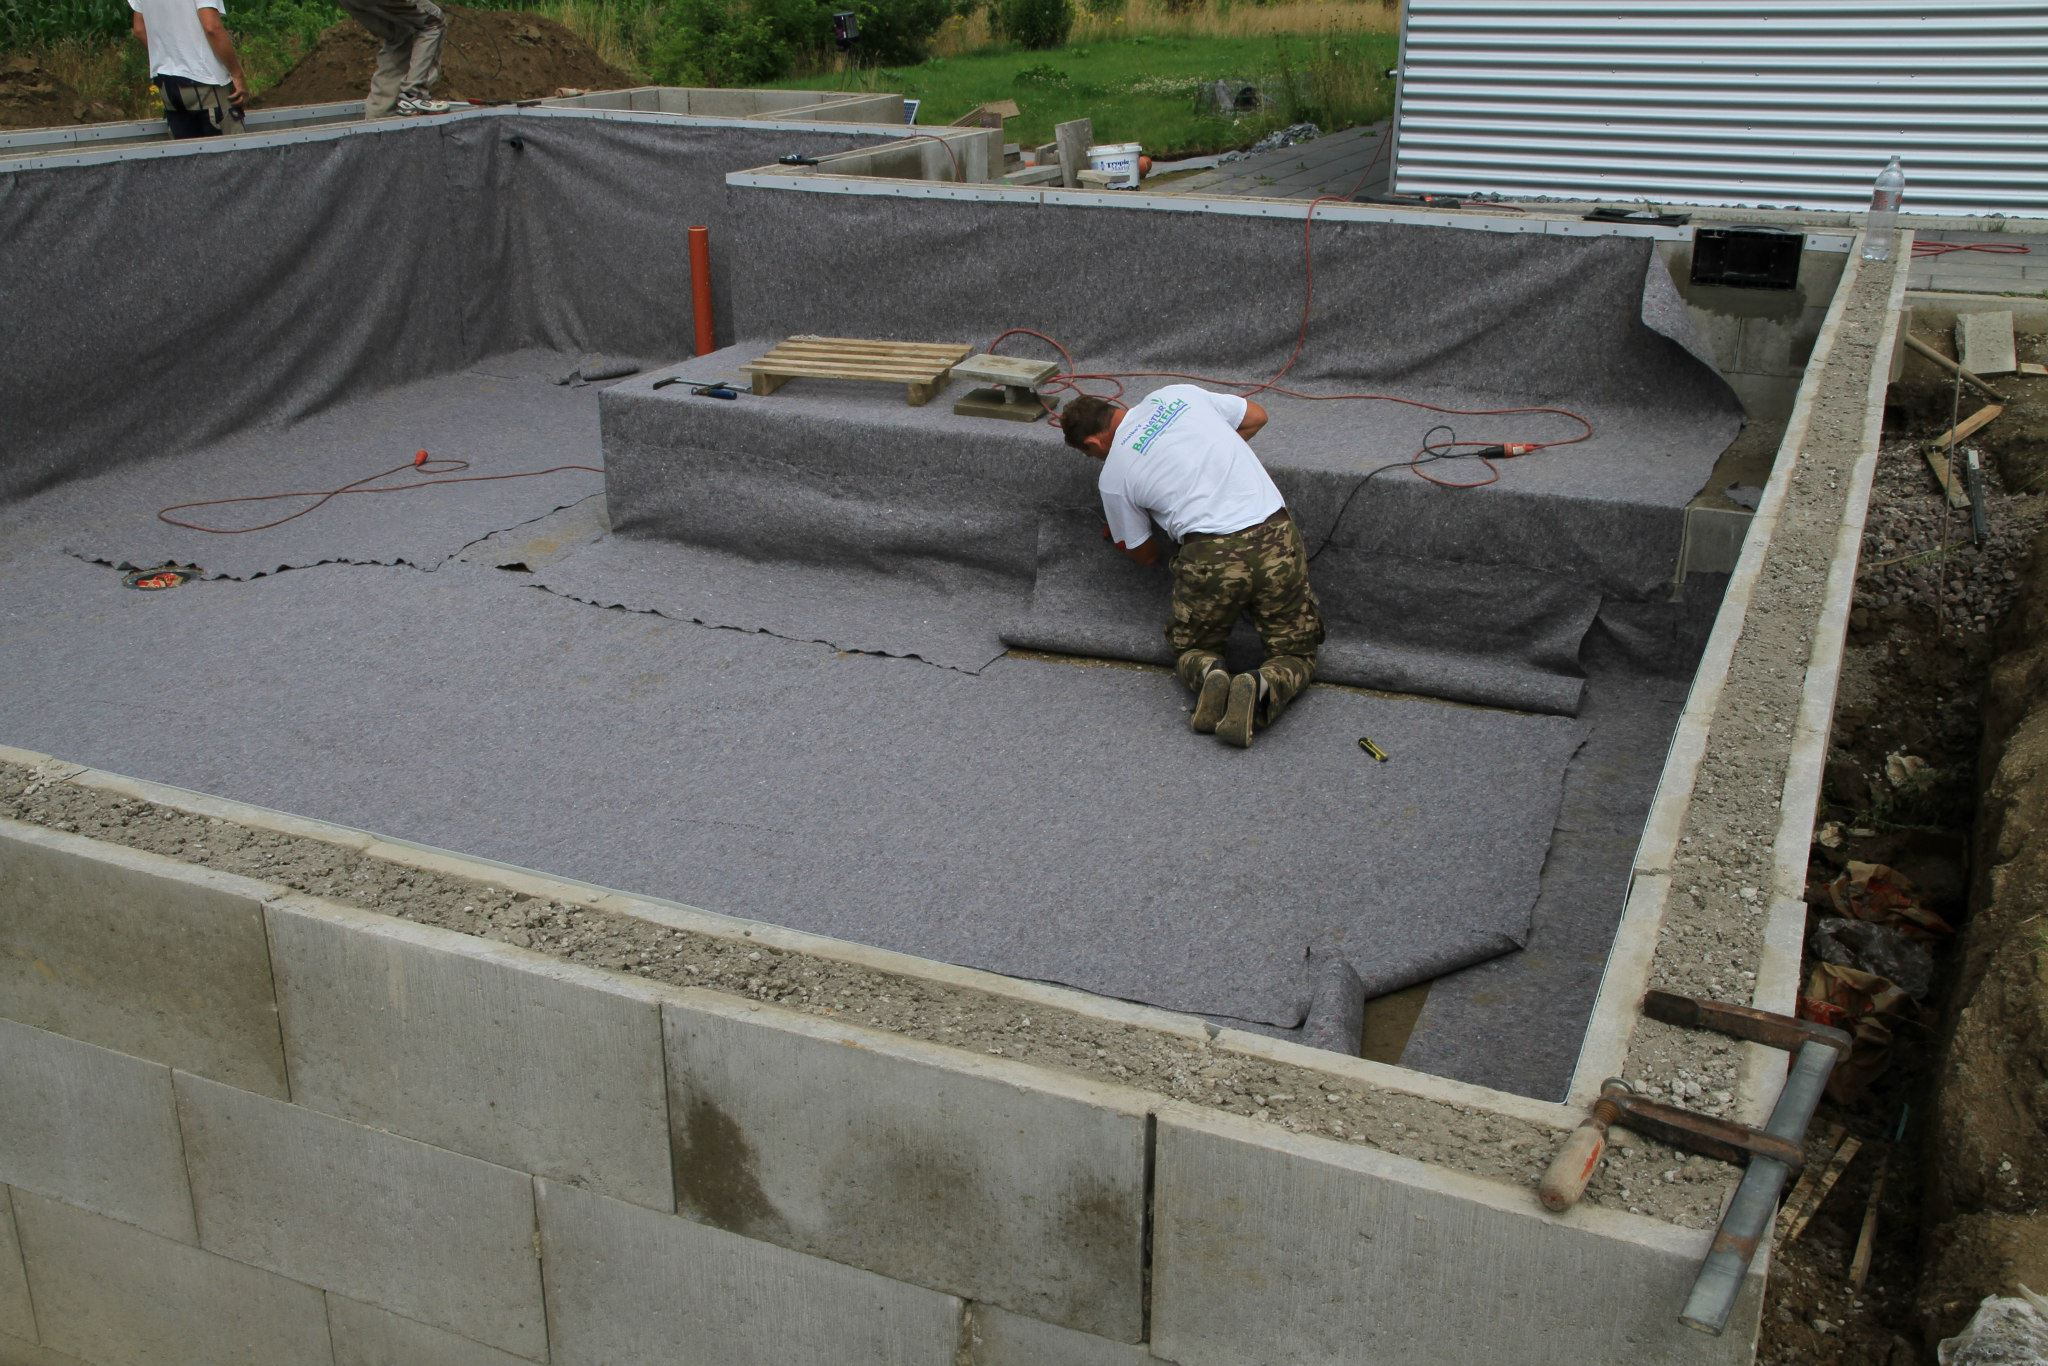 Prächtig Gartenteich – Beton, Folie oder Kunststoffwanne? – Blog aquapro2000 &MH_18